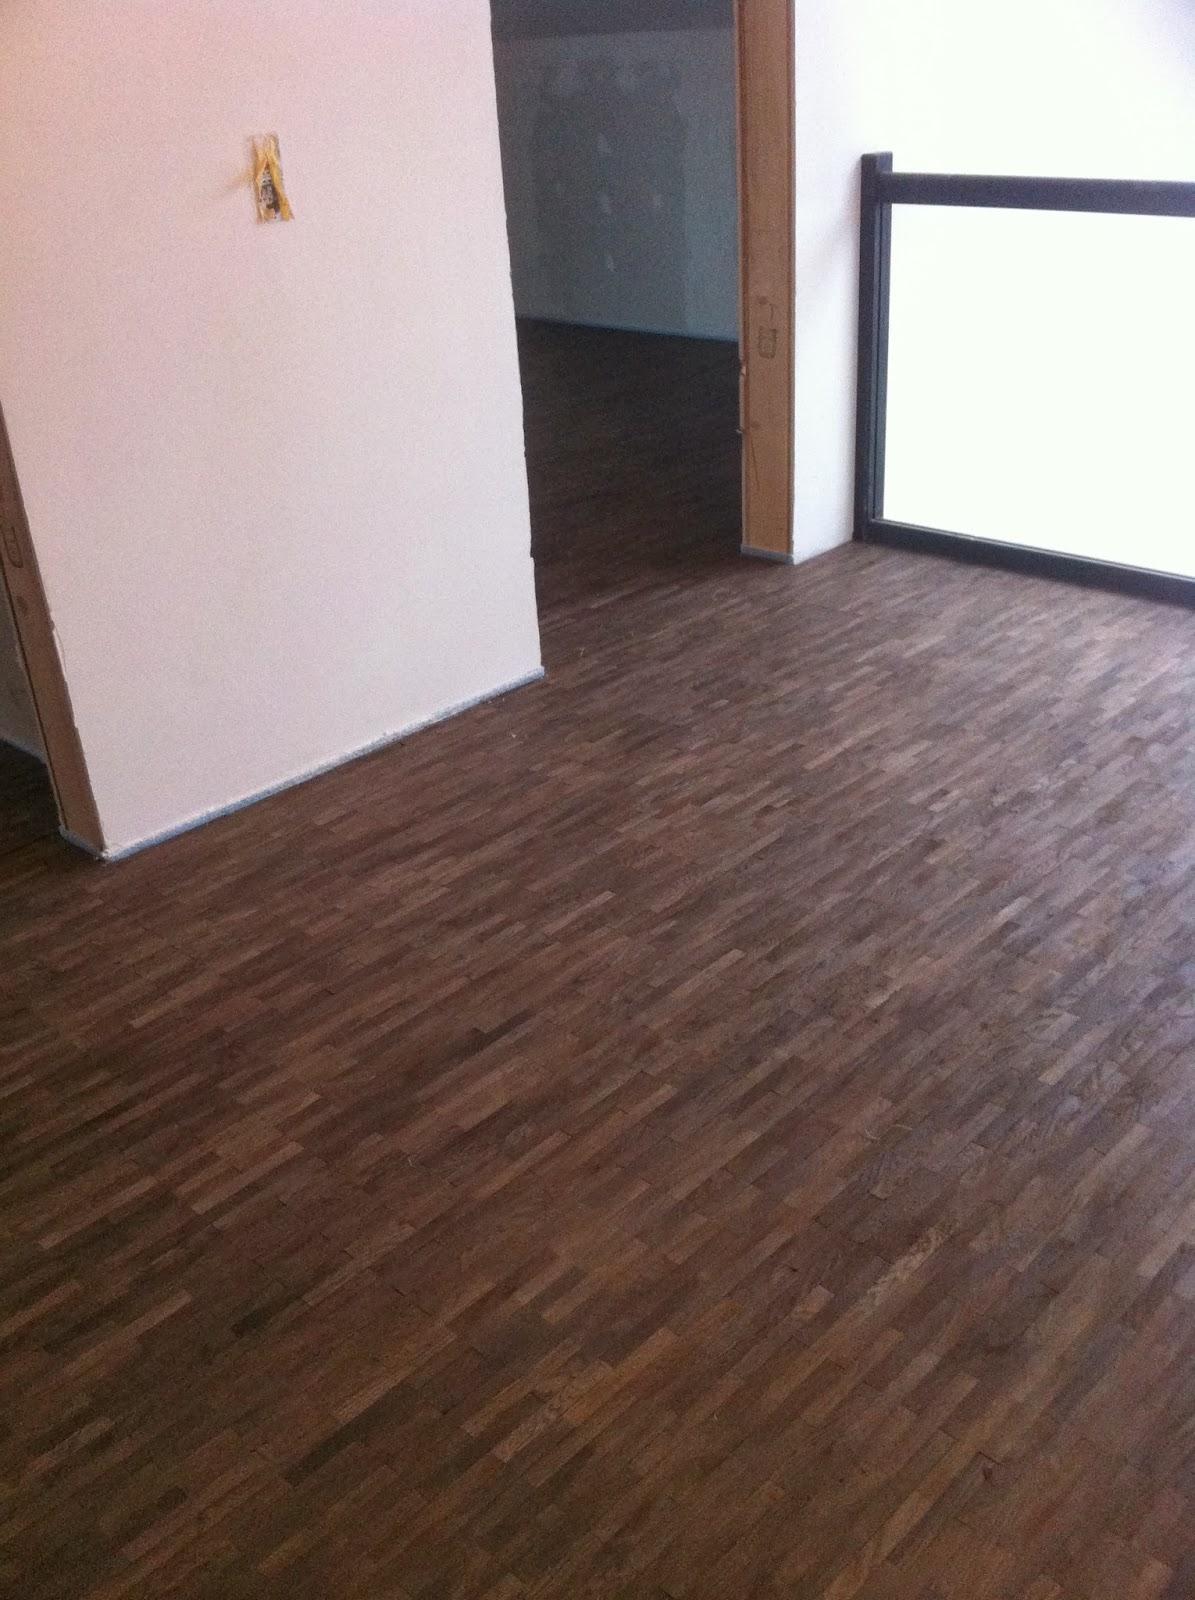 unser traumhaus danwood point 238 im odenwald mosaik parkett in unserem danwood point 238. Black Bedroom Furniture Sets. Home Design Ideas